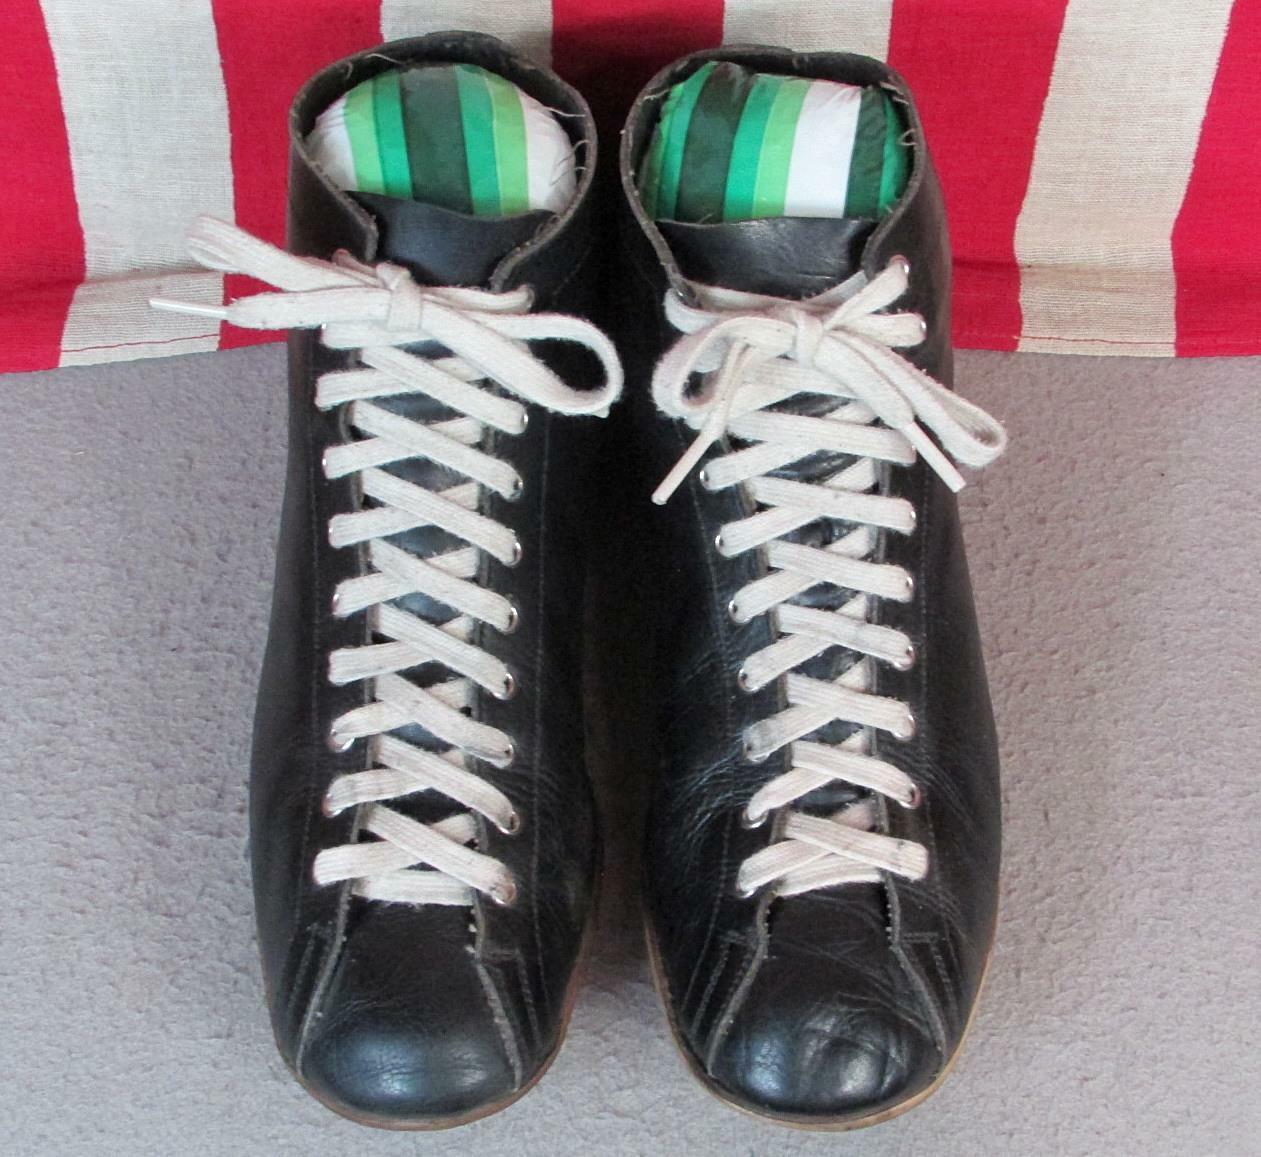 Vintage 1930s Black Leather High Top Athletic Sho… - image 4